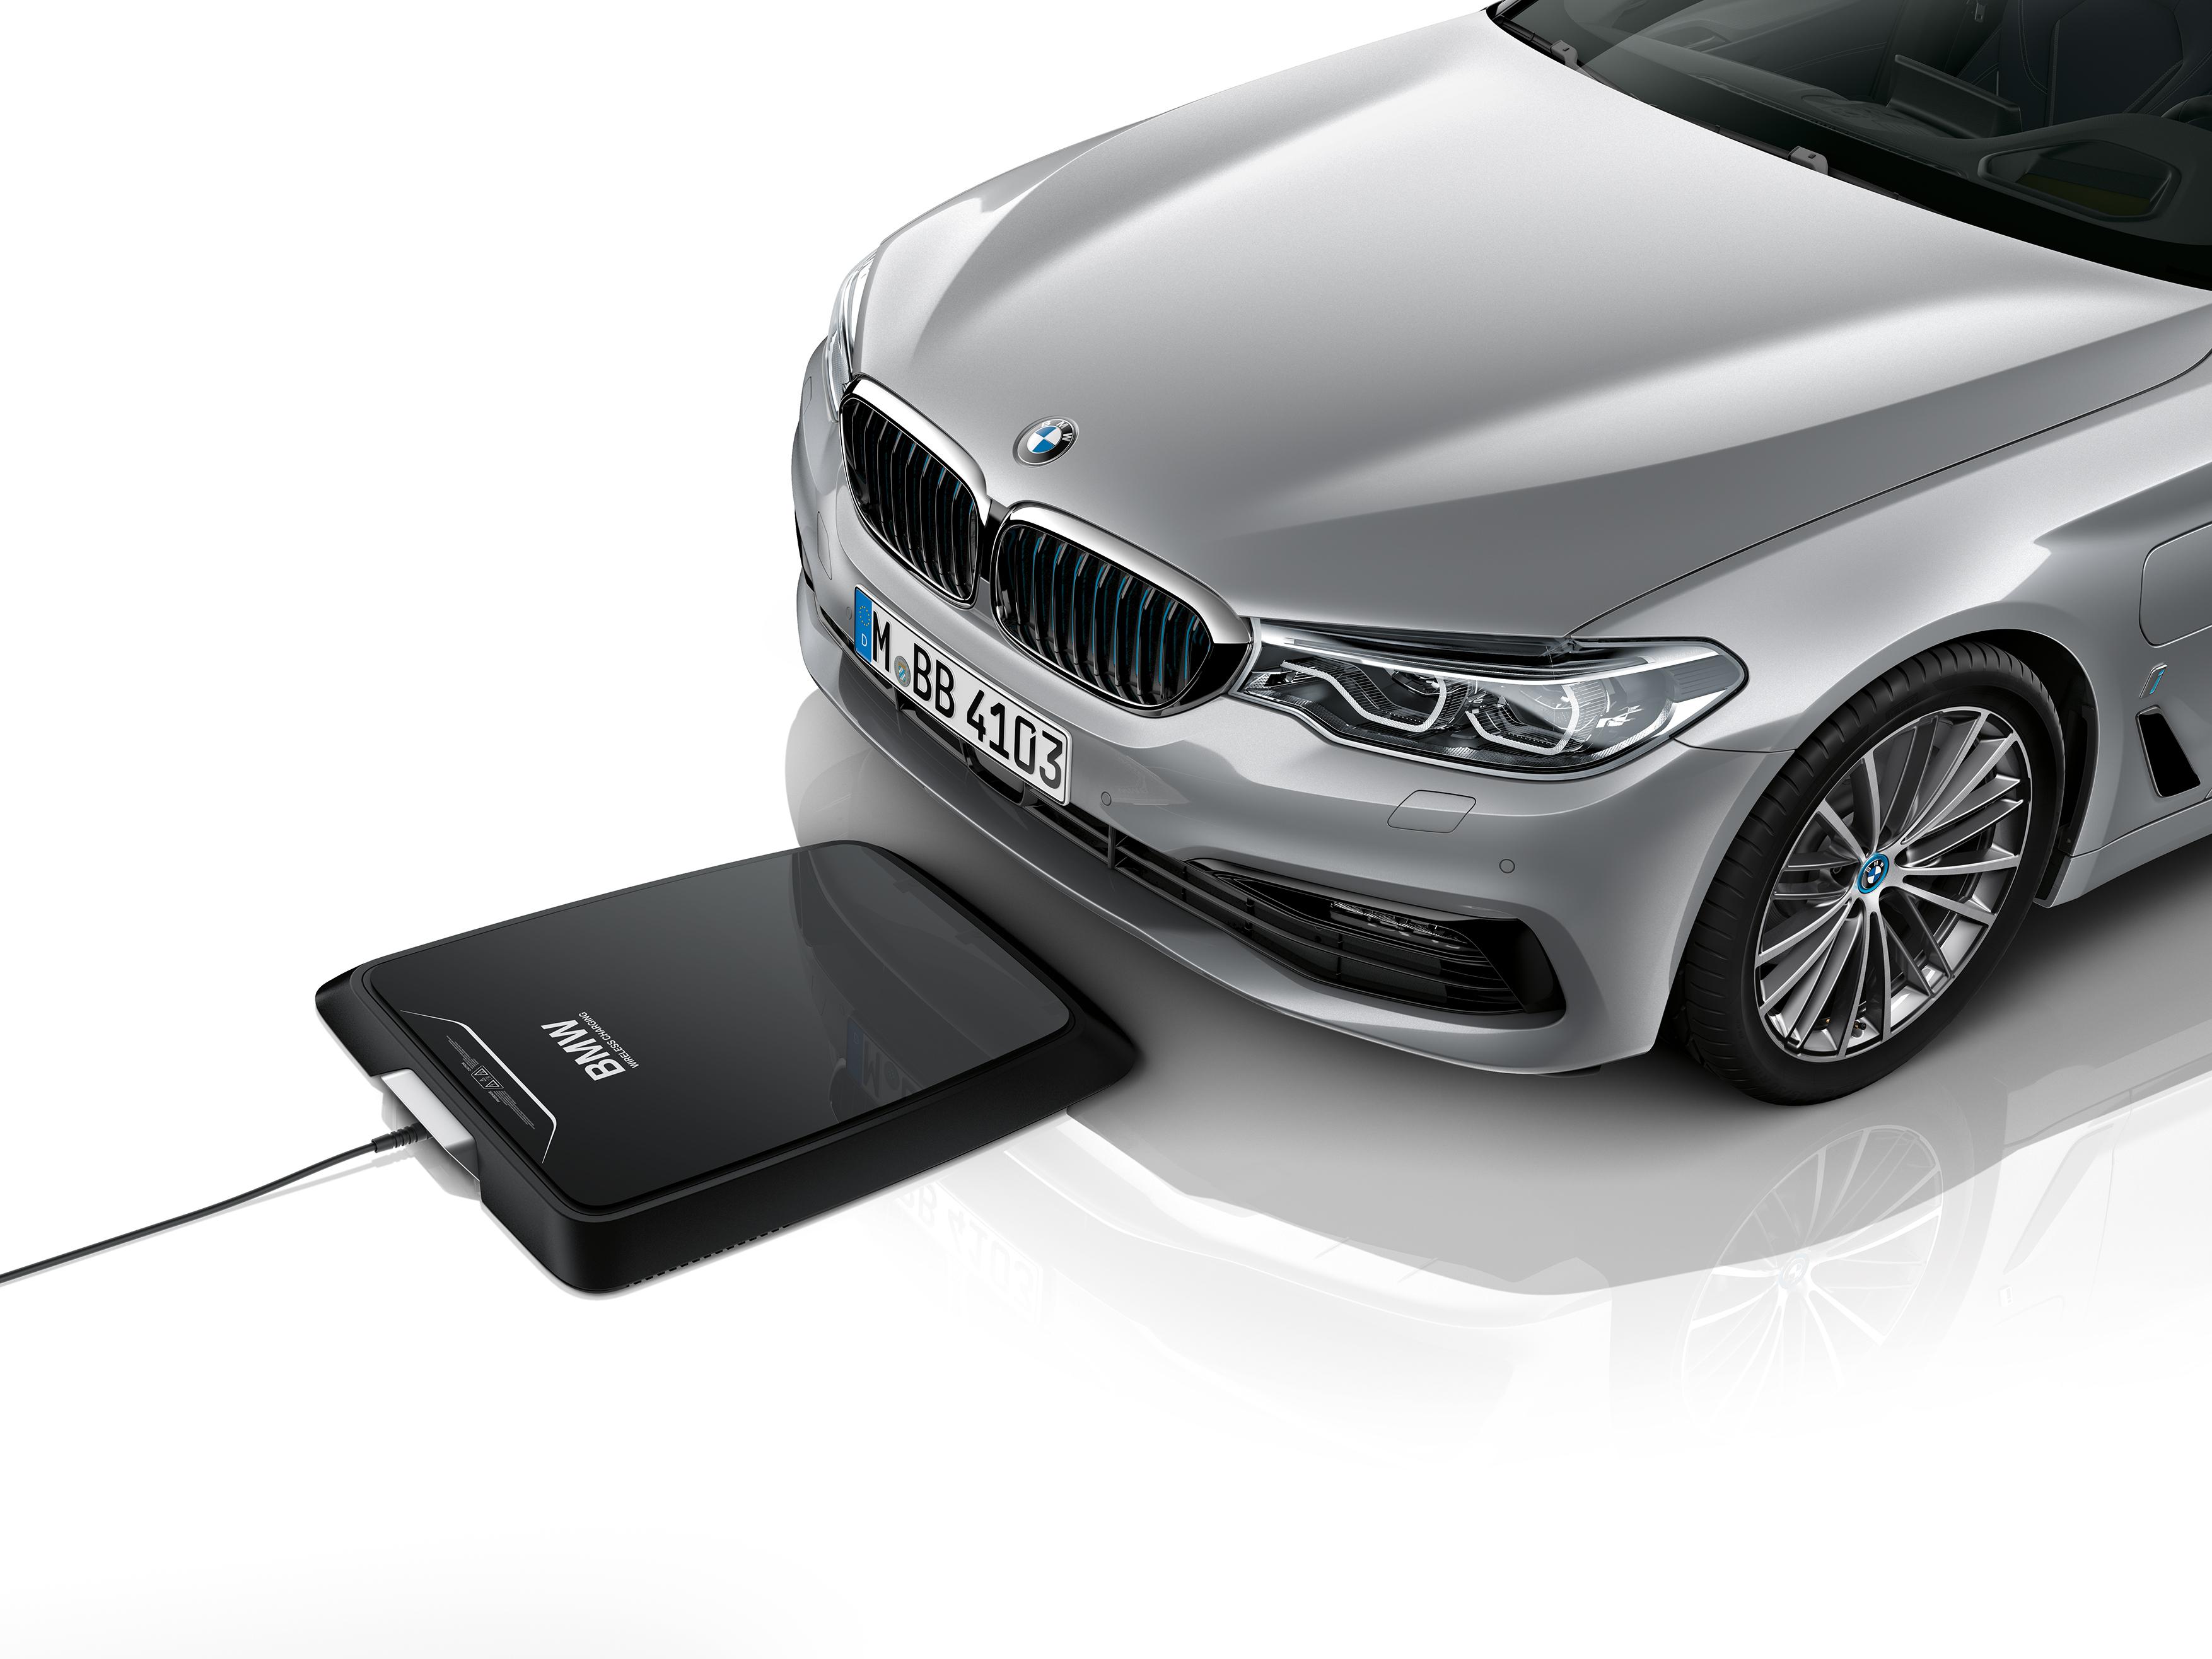 Bmw Wireless Charging In Detail Bimmerfile